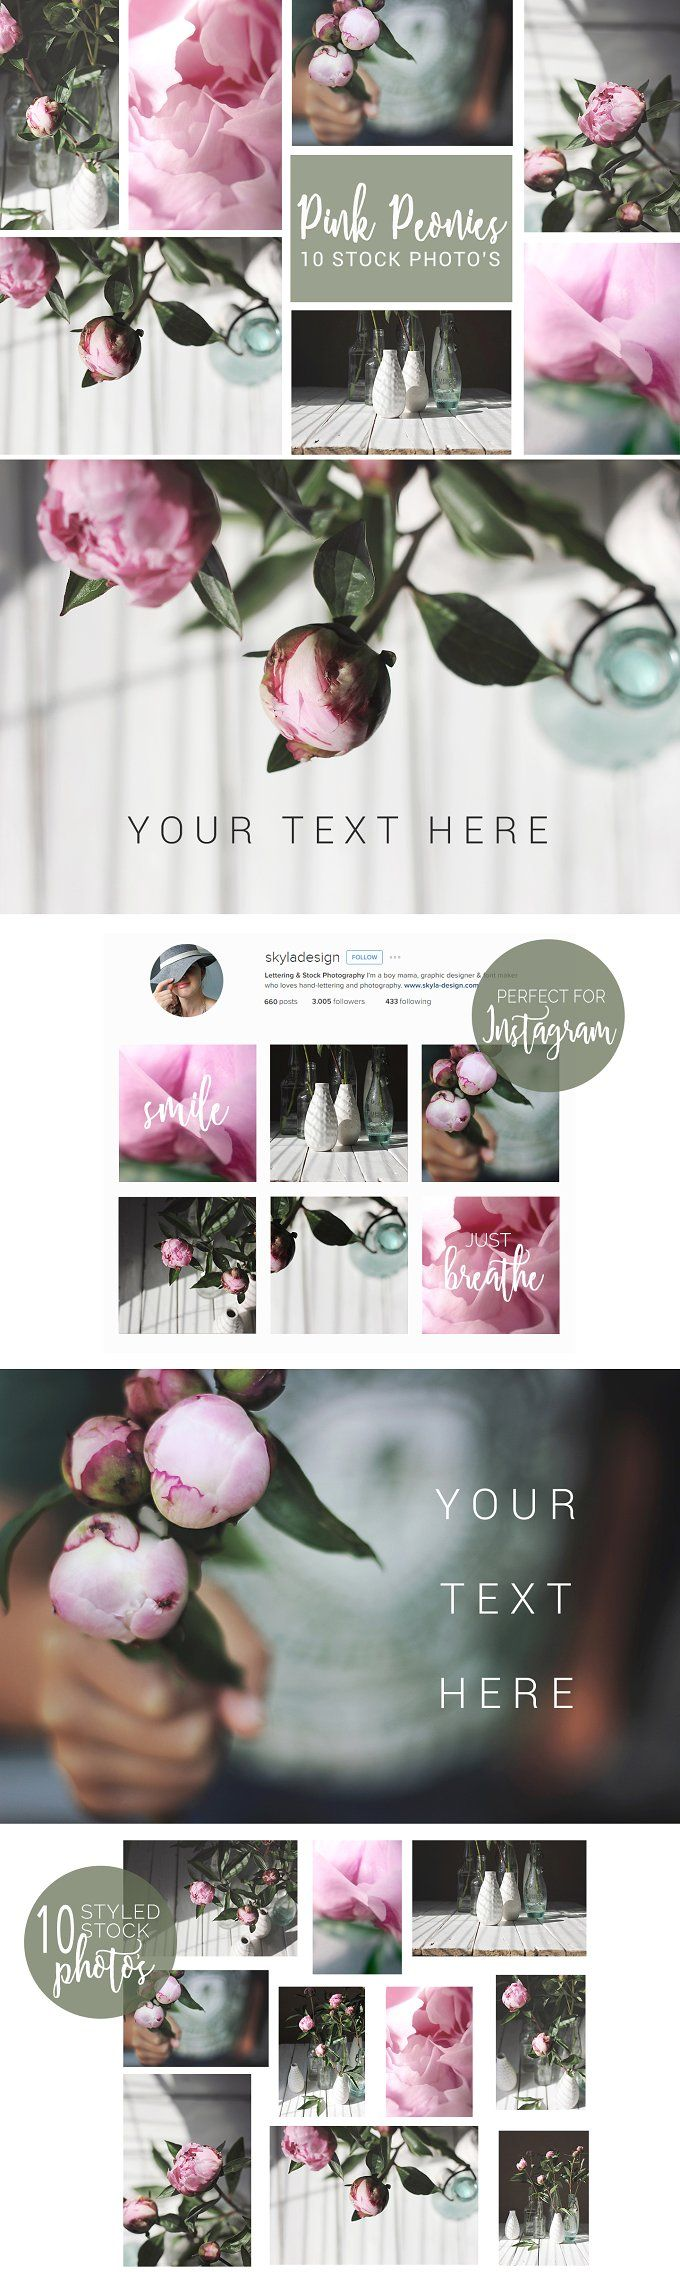 Pink peonies, styled stock photos by Skyla Design on @creativemarket #pink #peonies #flowers #floral #leaves #greenery #white #stock #styled #image #bundle #picture #frame #scene #creator #vectors #design #kit #preset #overlay #graphic #design #photoshop #lightroom #actions #brush #premade #social #media #print #download #website #digital #template #theme #blog #facebook #feminine #instagram #mockup